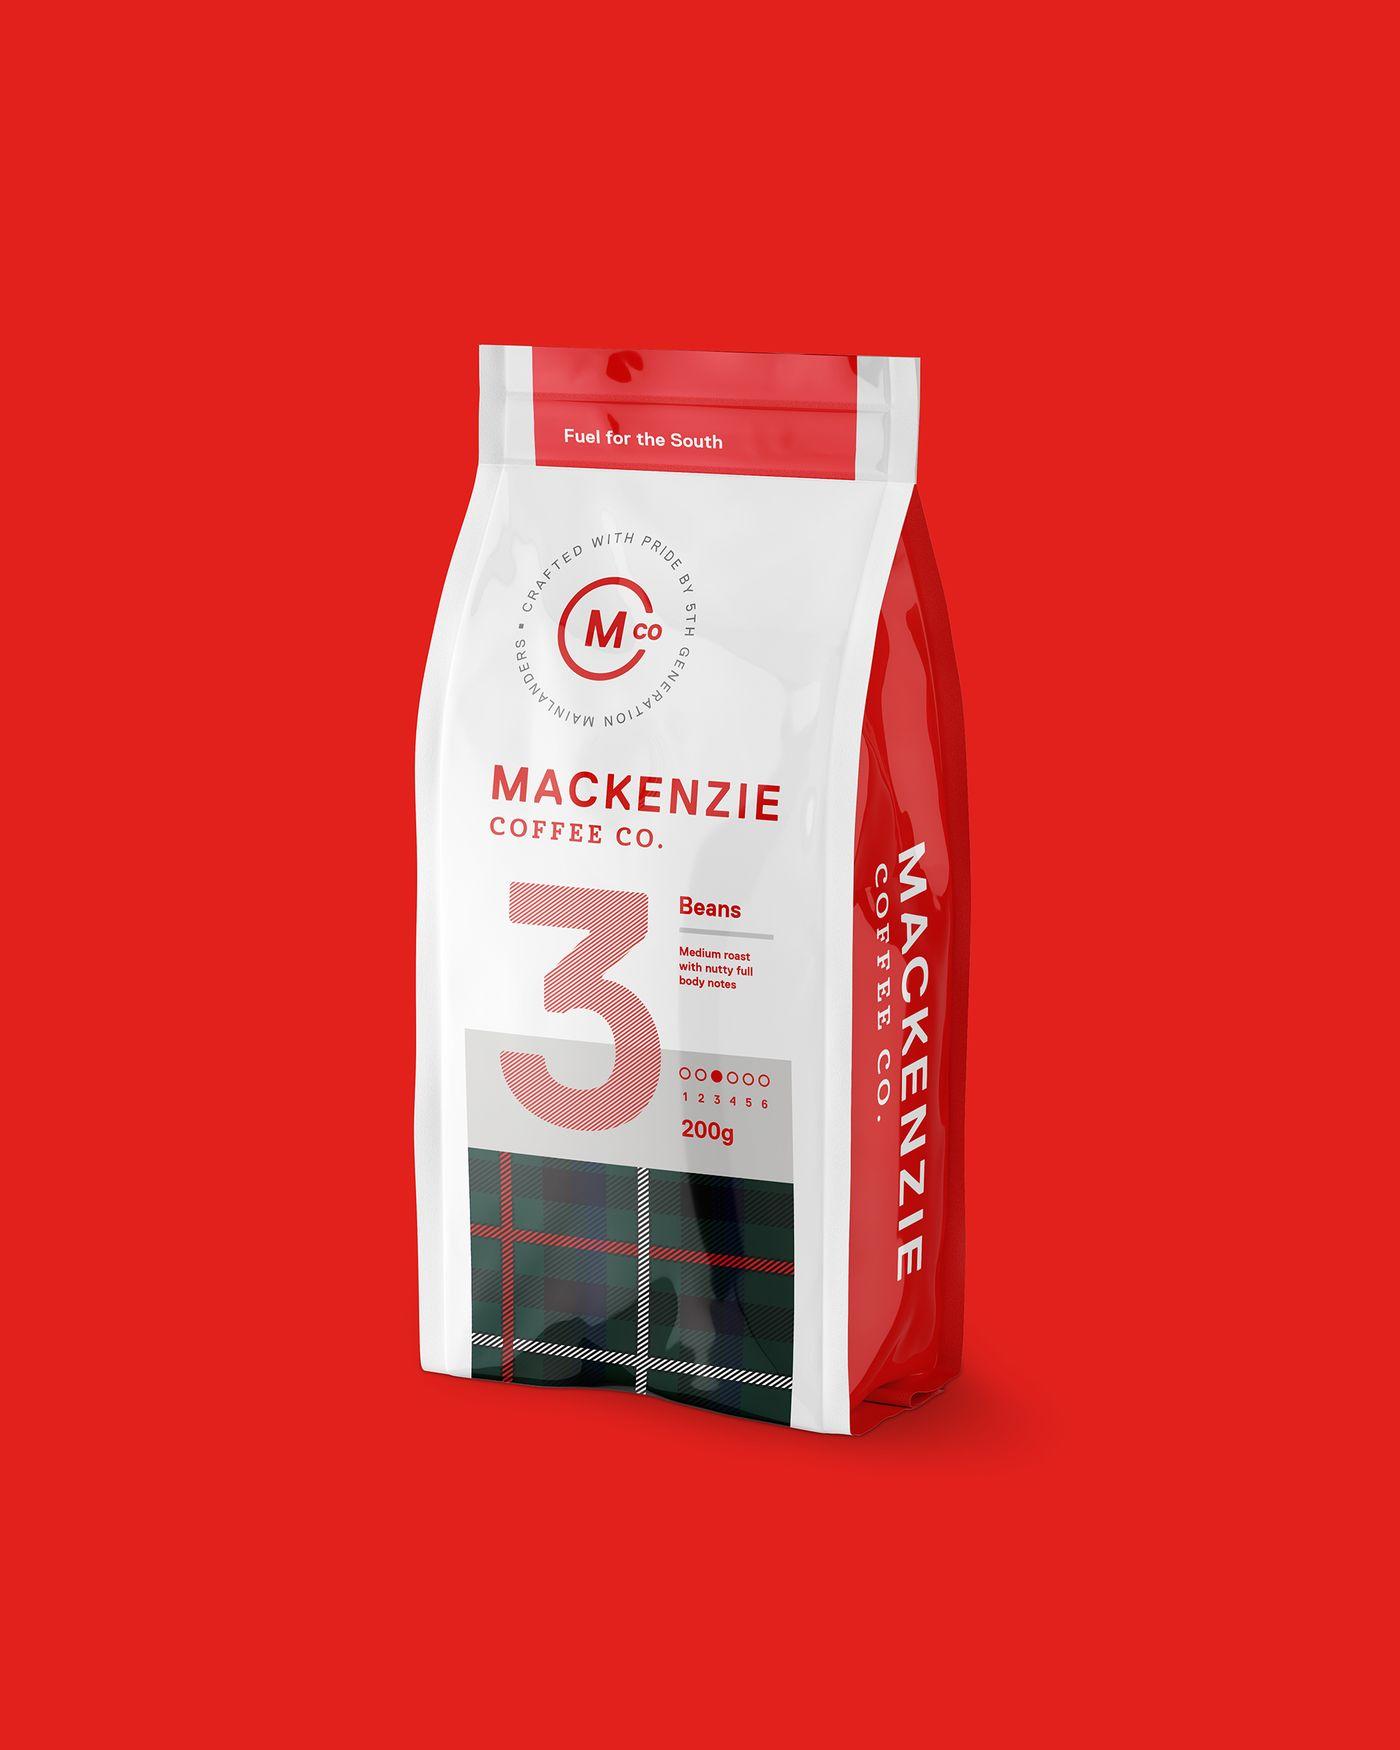 Mackenzie Coffee Co 200g Retail Pack 3